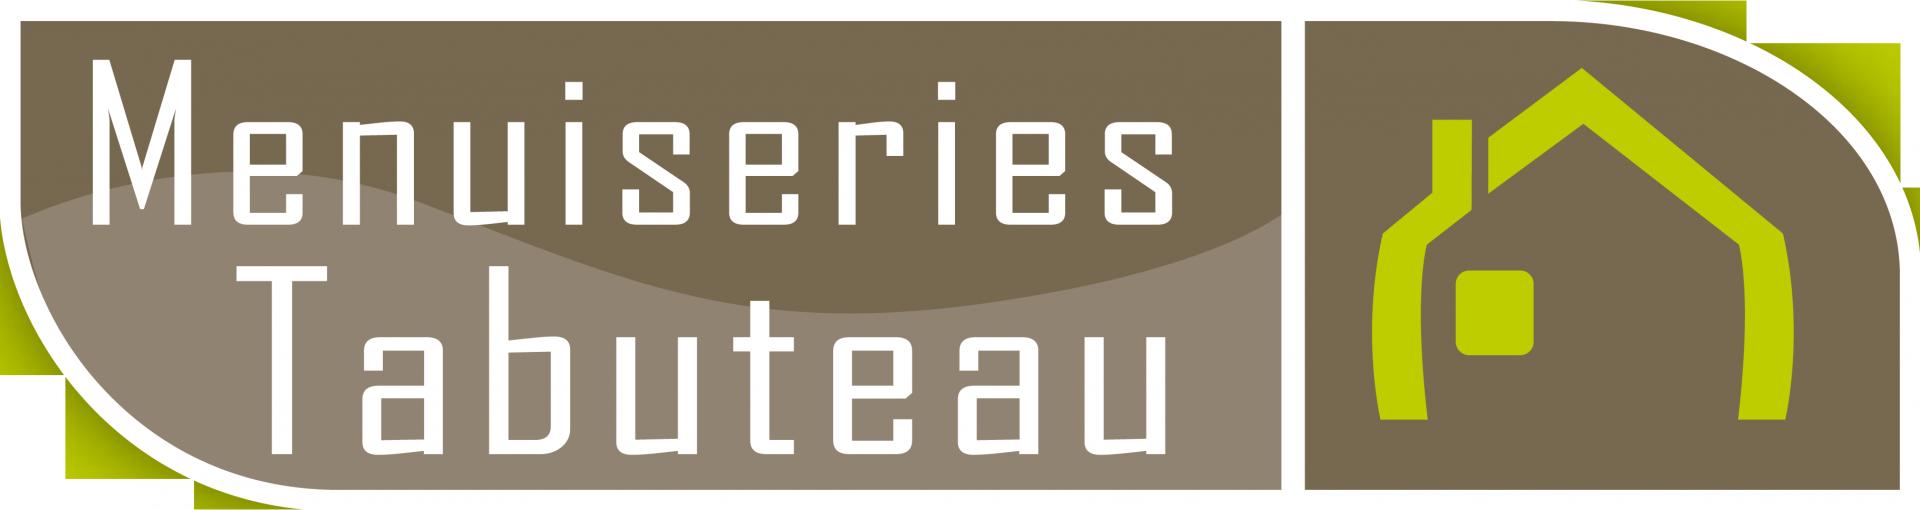 Menuiserie De France Merignac pose de placard sur mesure arcachon - menuiseries tabuteau